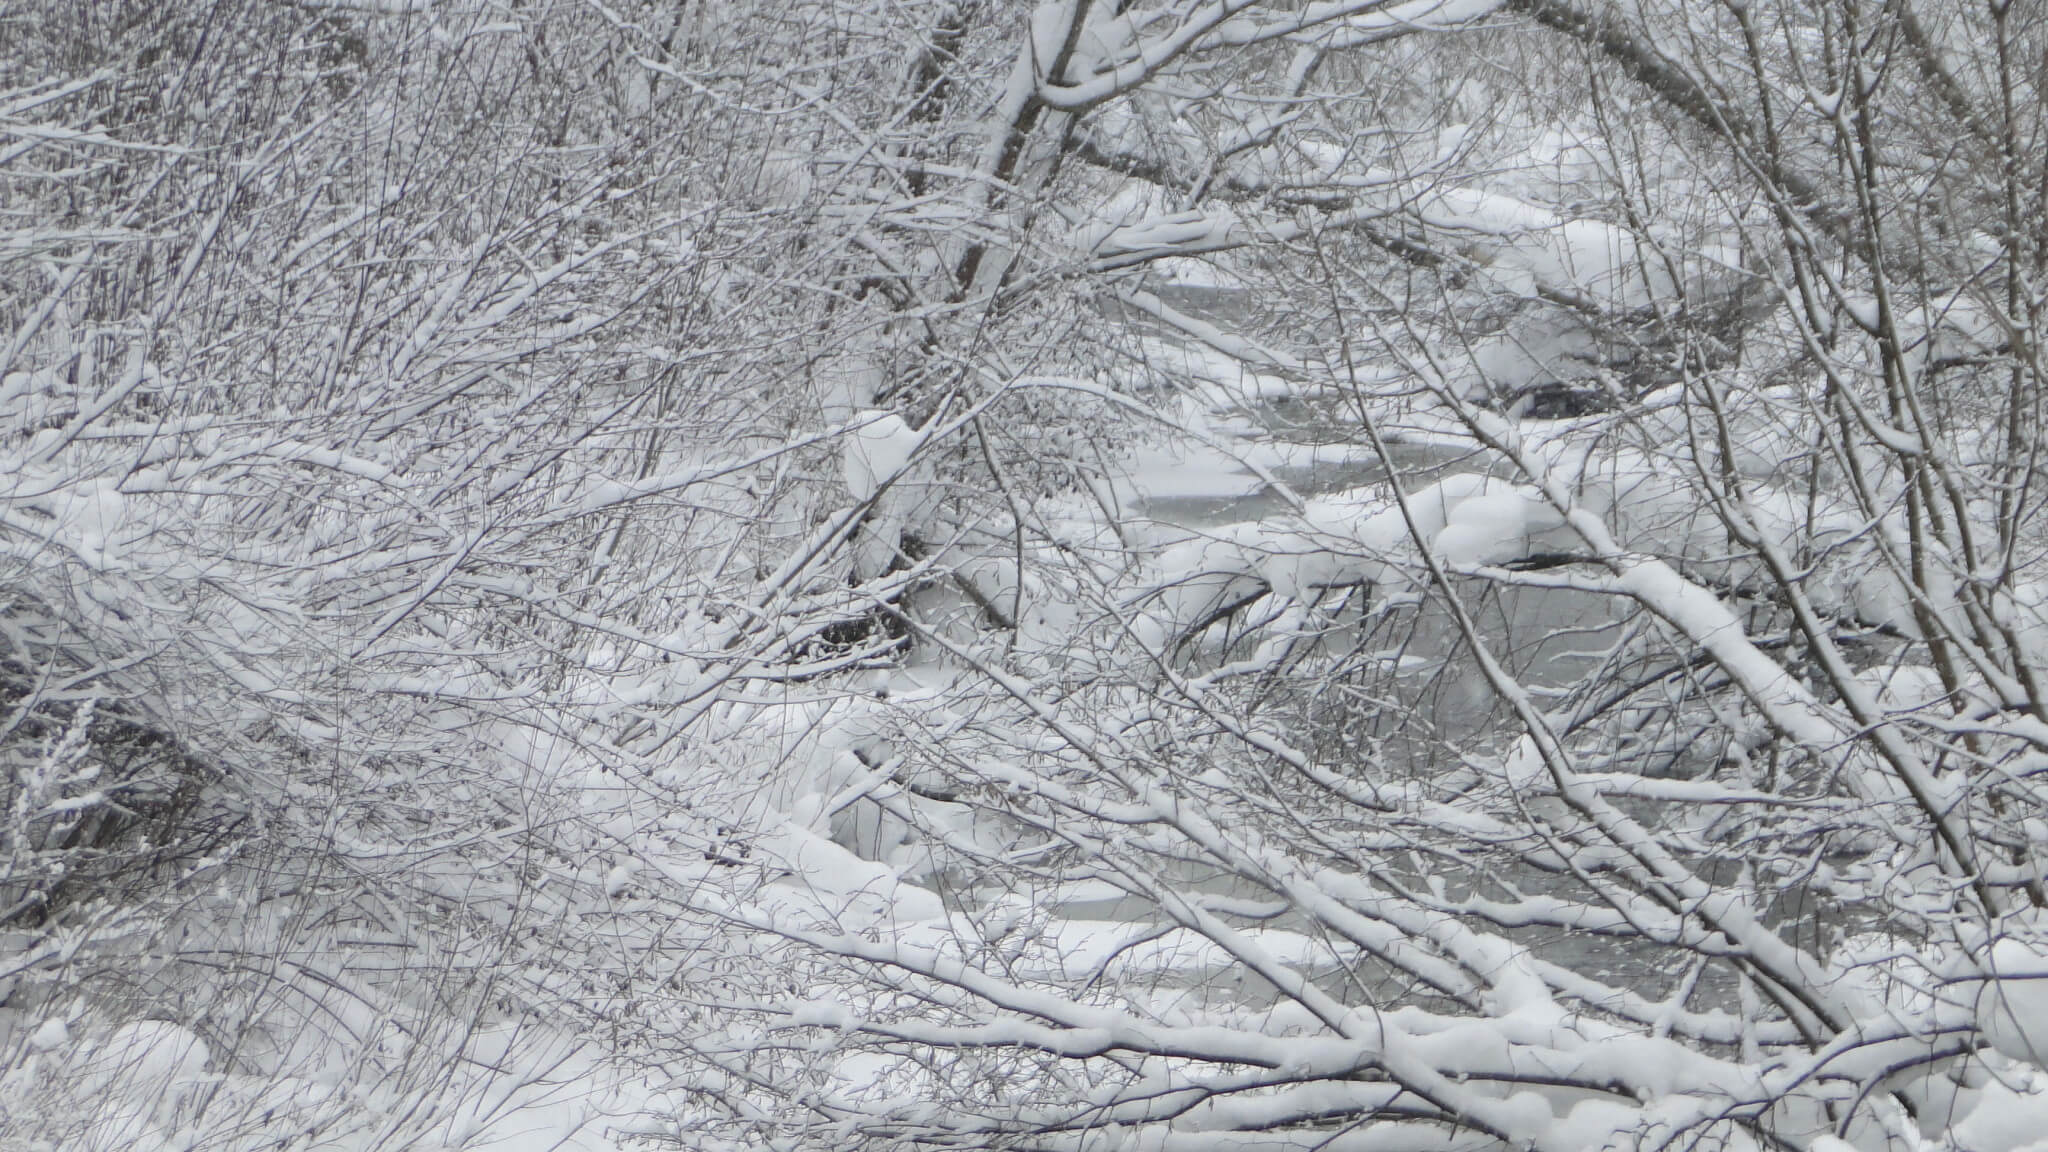 Śnieg,  śnieg, śnieg!... 3